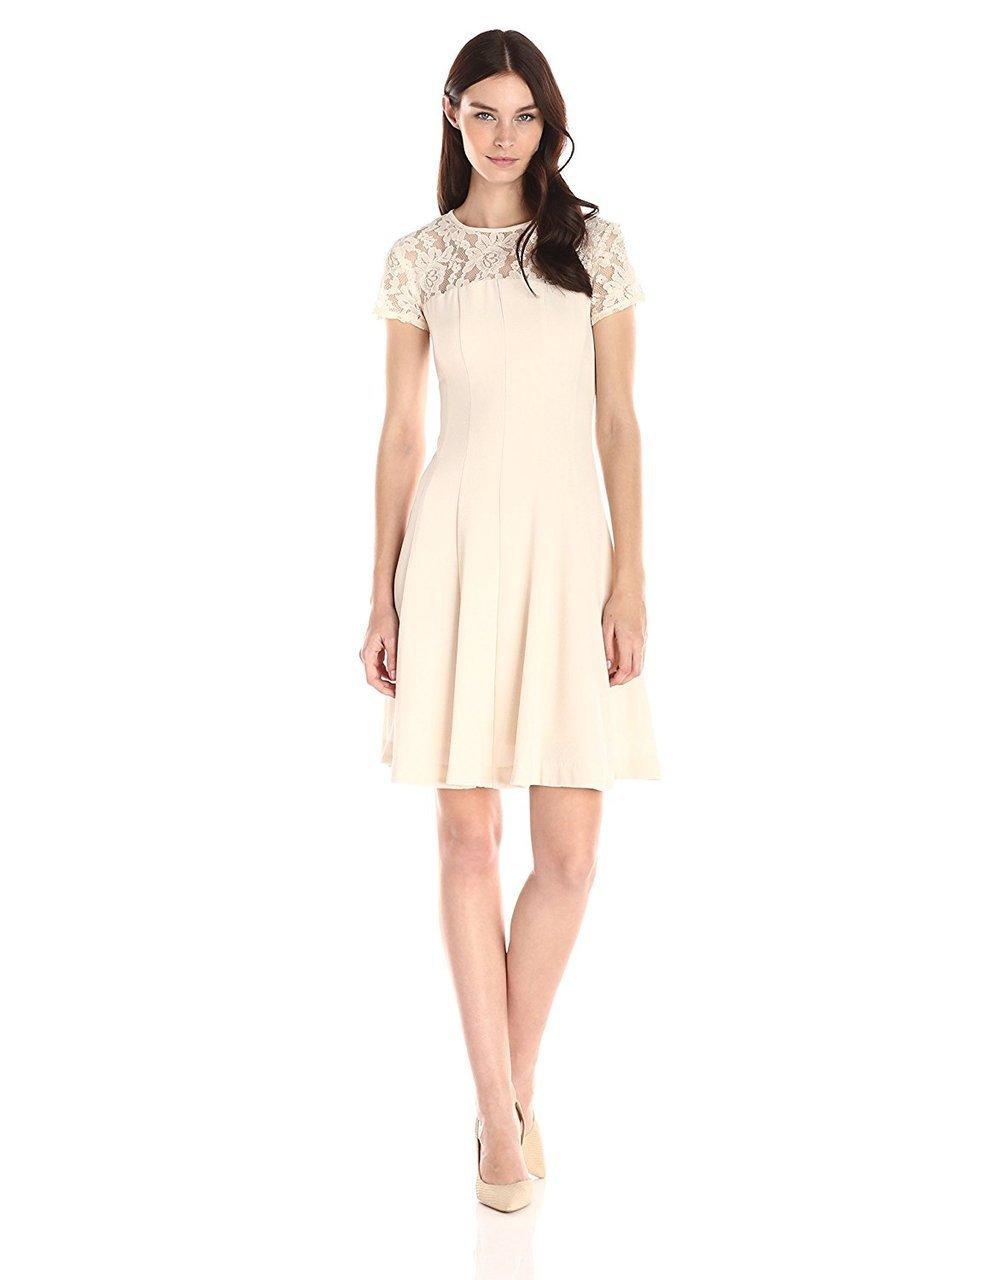 Taylor - 7001M Short Sleeve Lace Flutter Dress